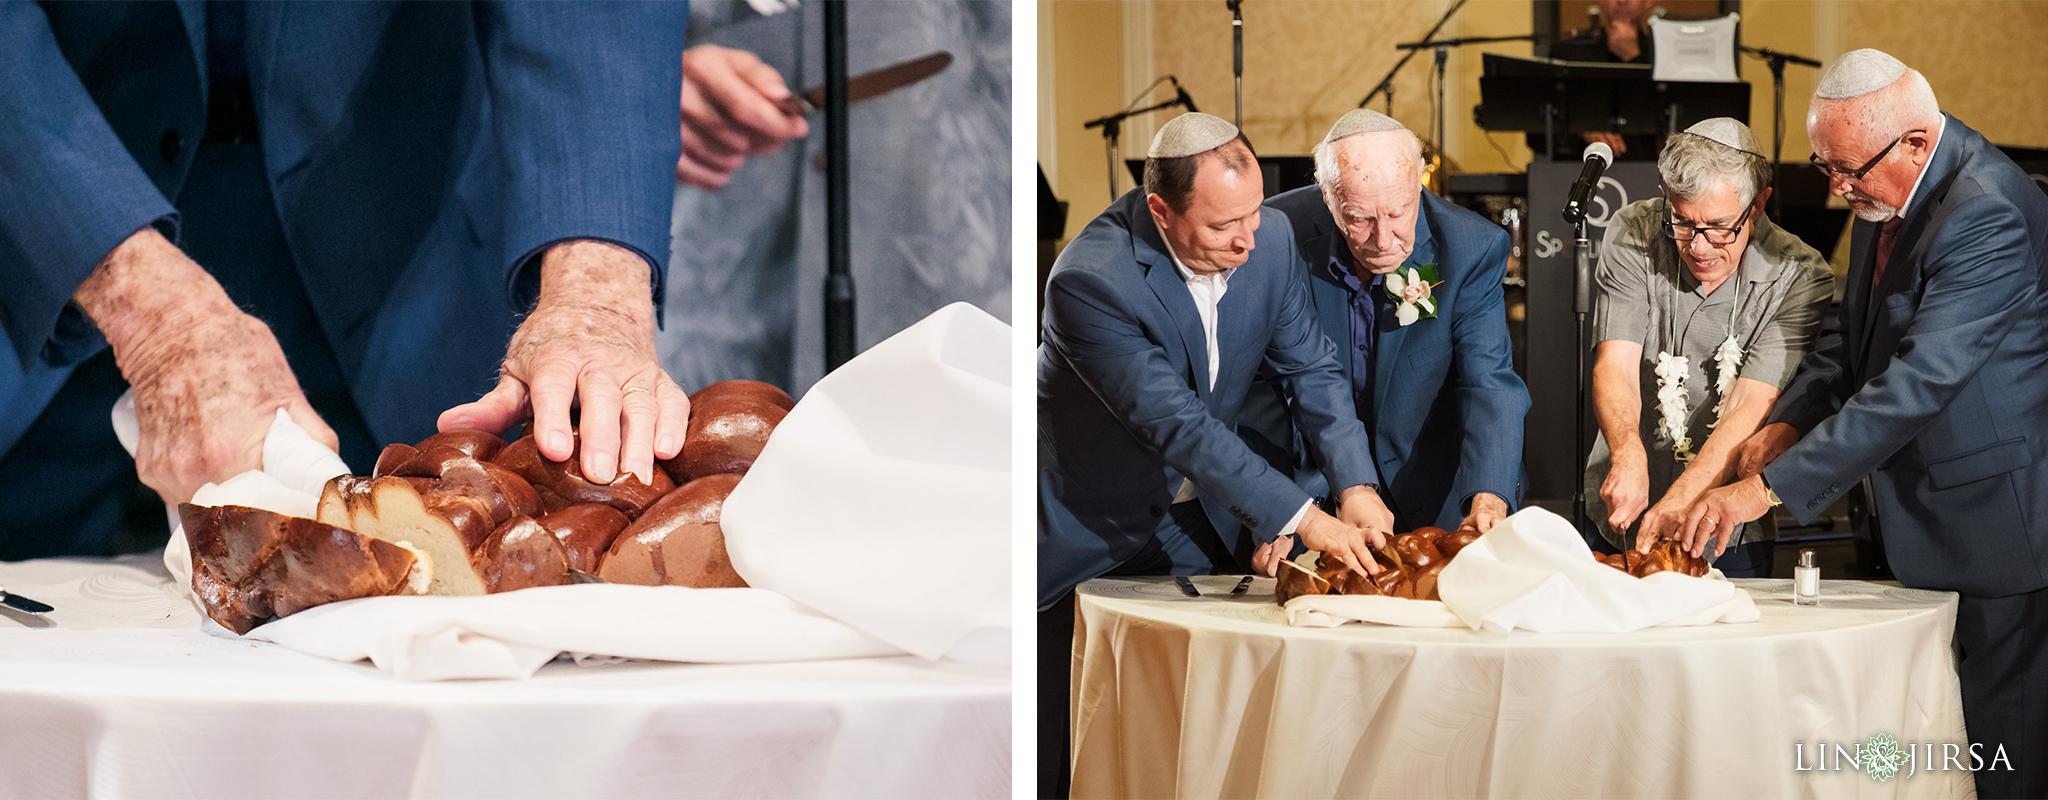 44 Hyatt Regency Huntington Beach Jewish Wedding Reception Challah Bread Photography.jpg